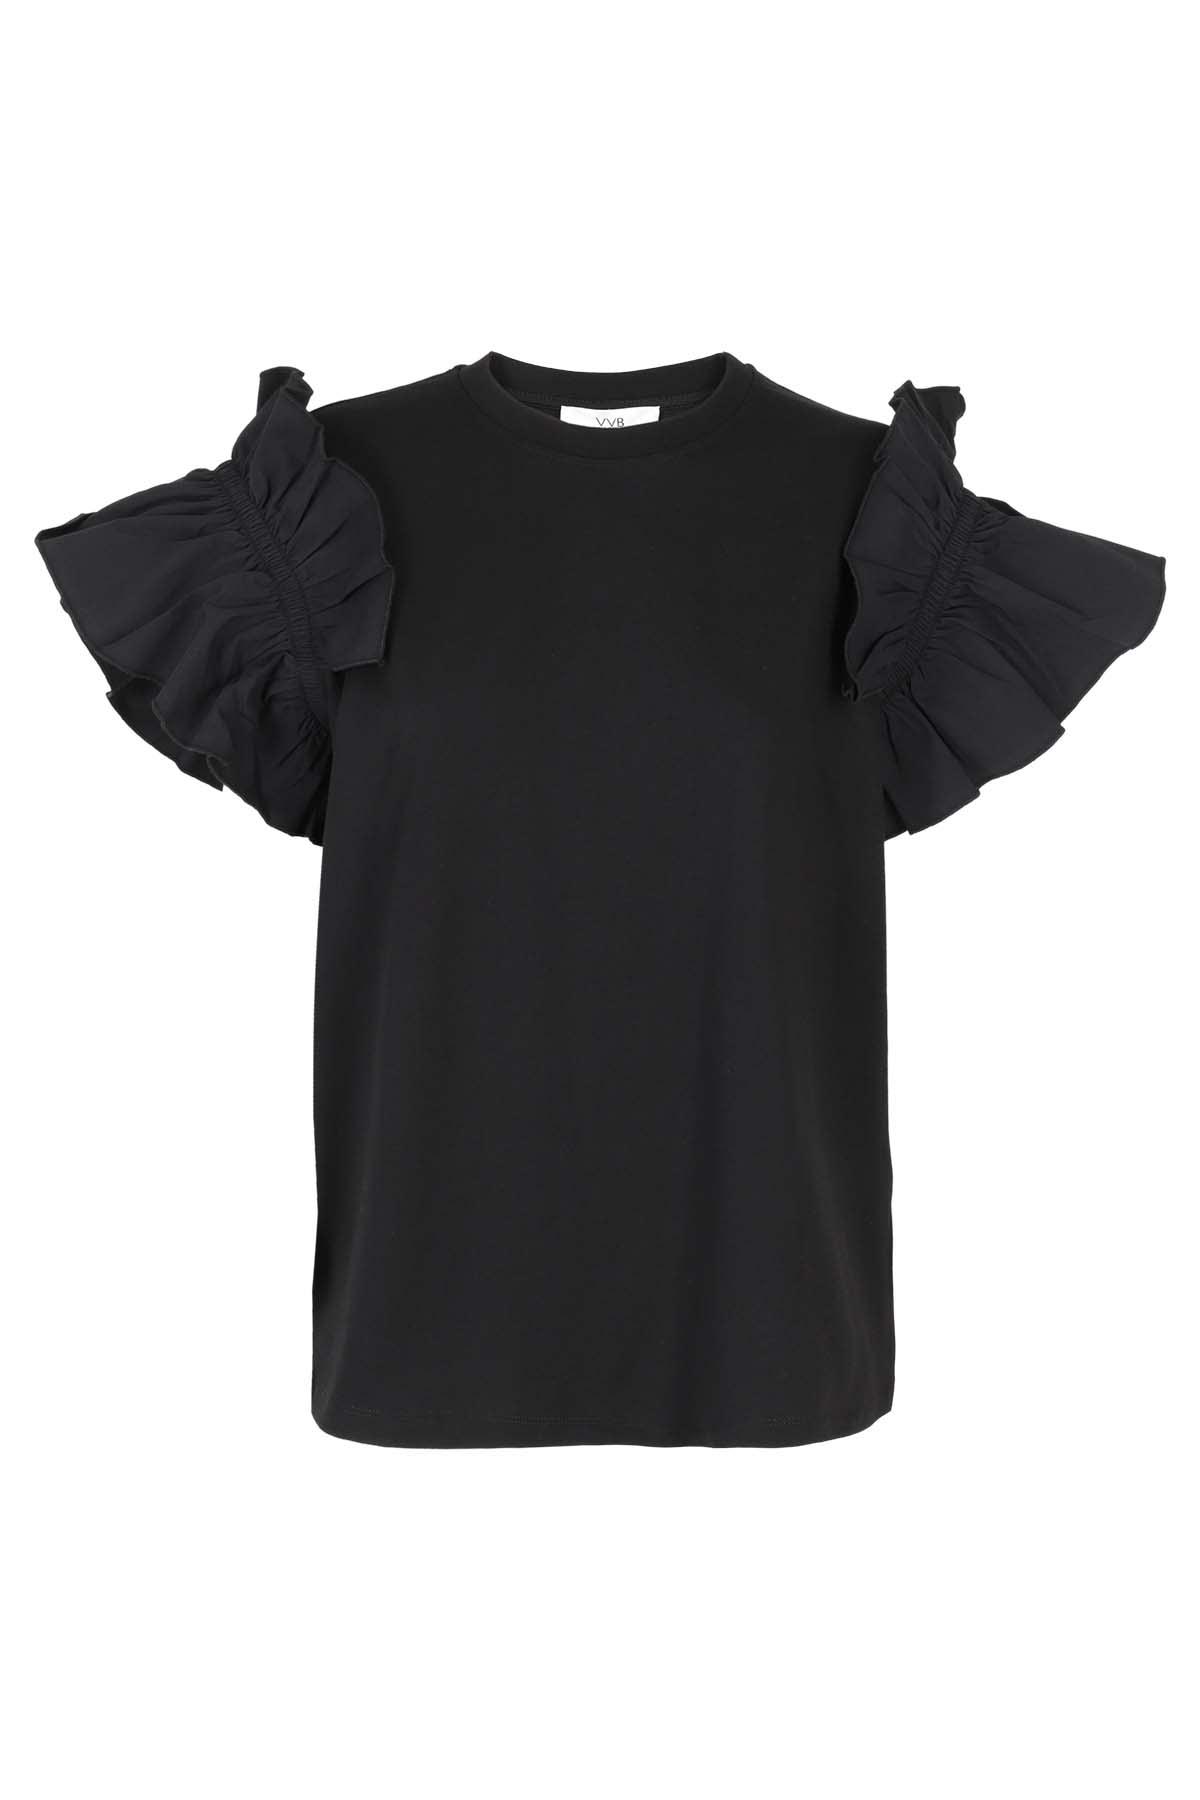 Victoria Victoria Beckham T-Shirt